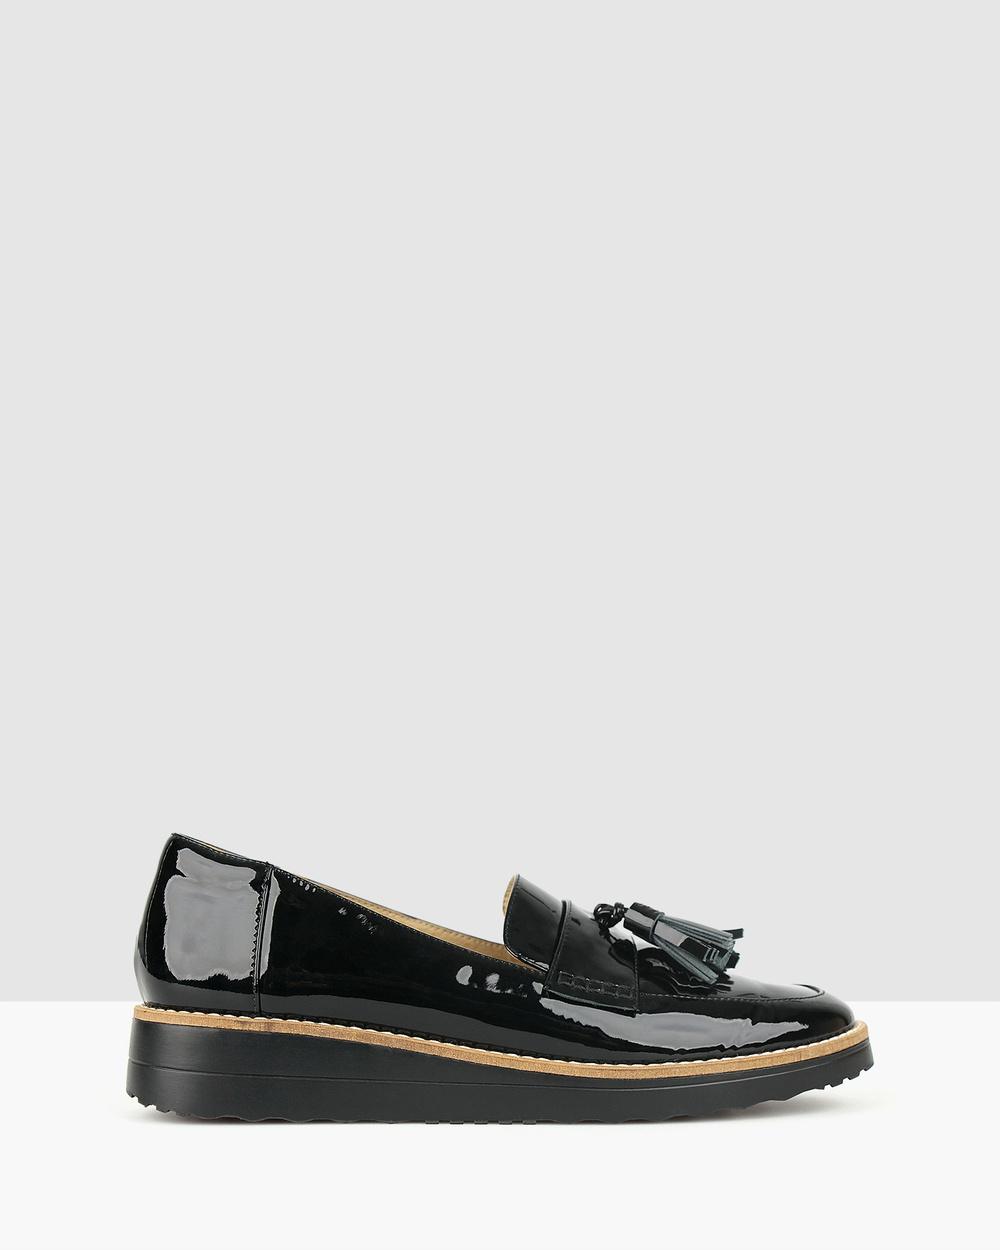 Airflex Dori Leather Loafers Flats Black Pat